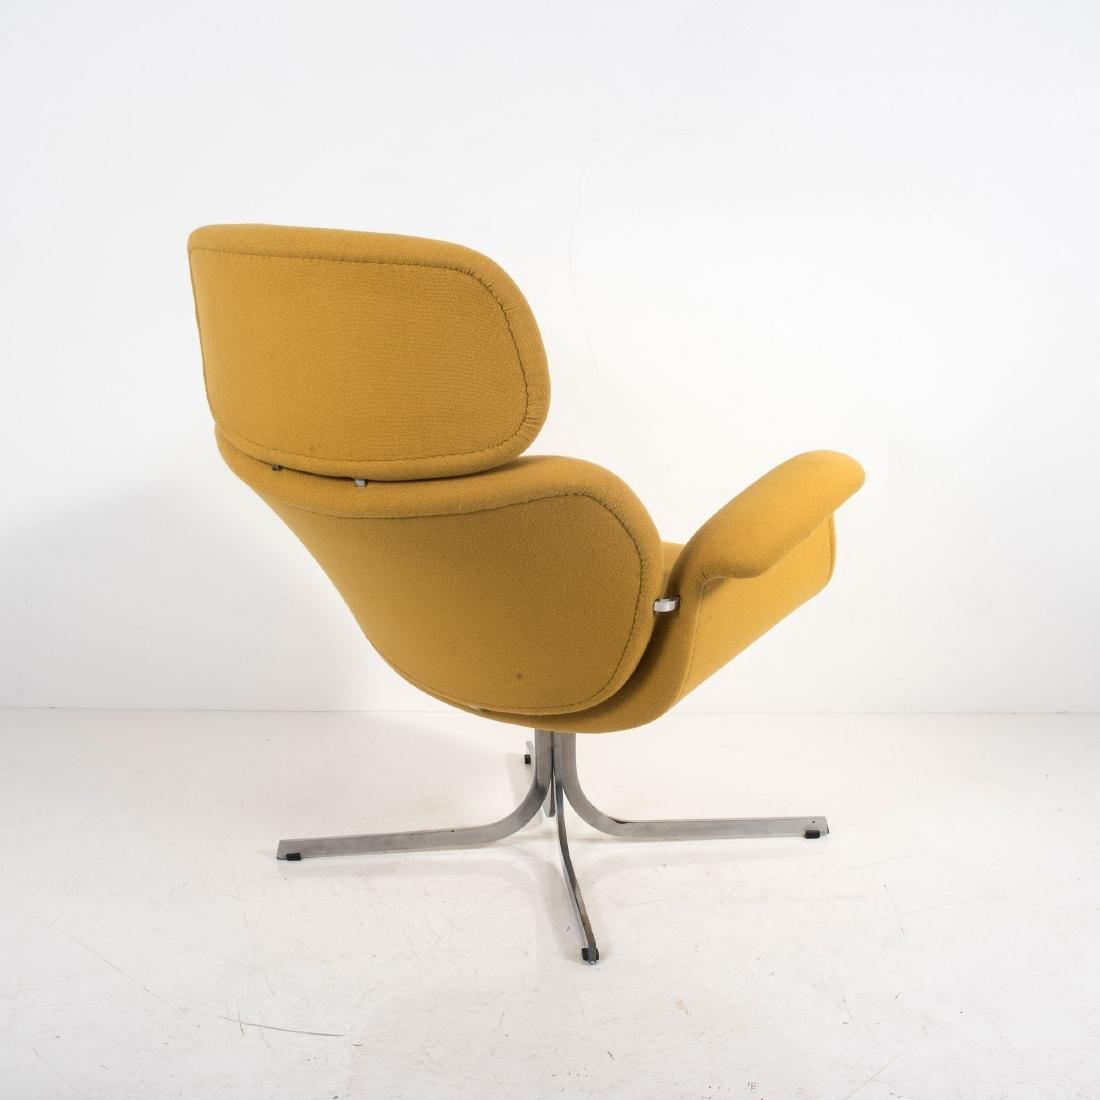 'F 545' - 'Big Tulip' easy chair, 1959 - 2